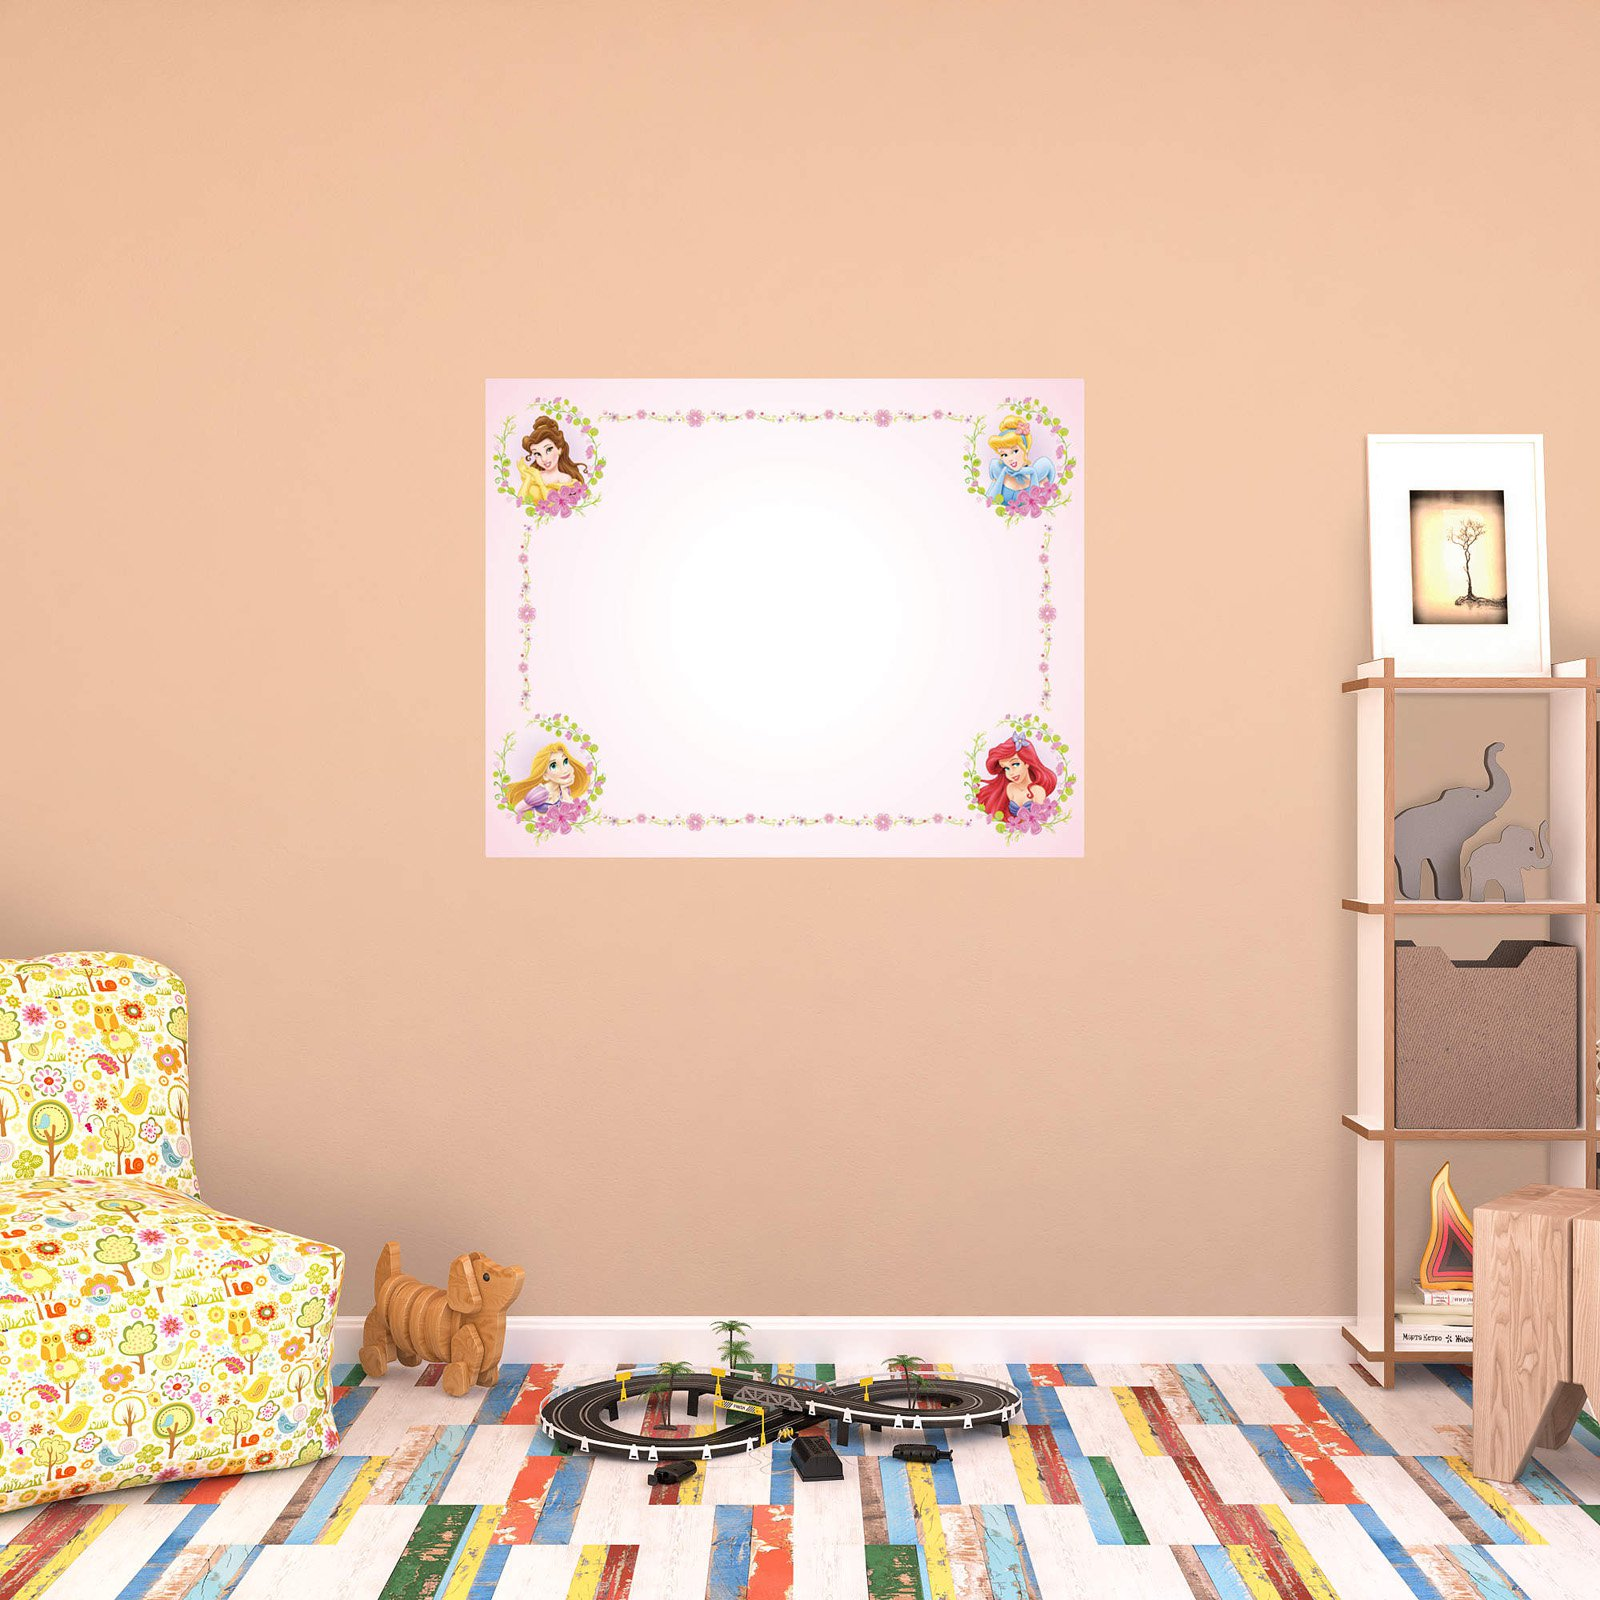 Fathead Disney Princess Dry Erase Whiteboard Wall Decal